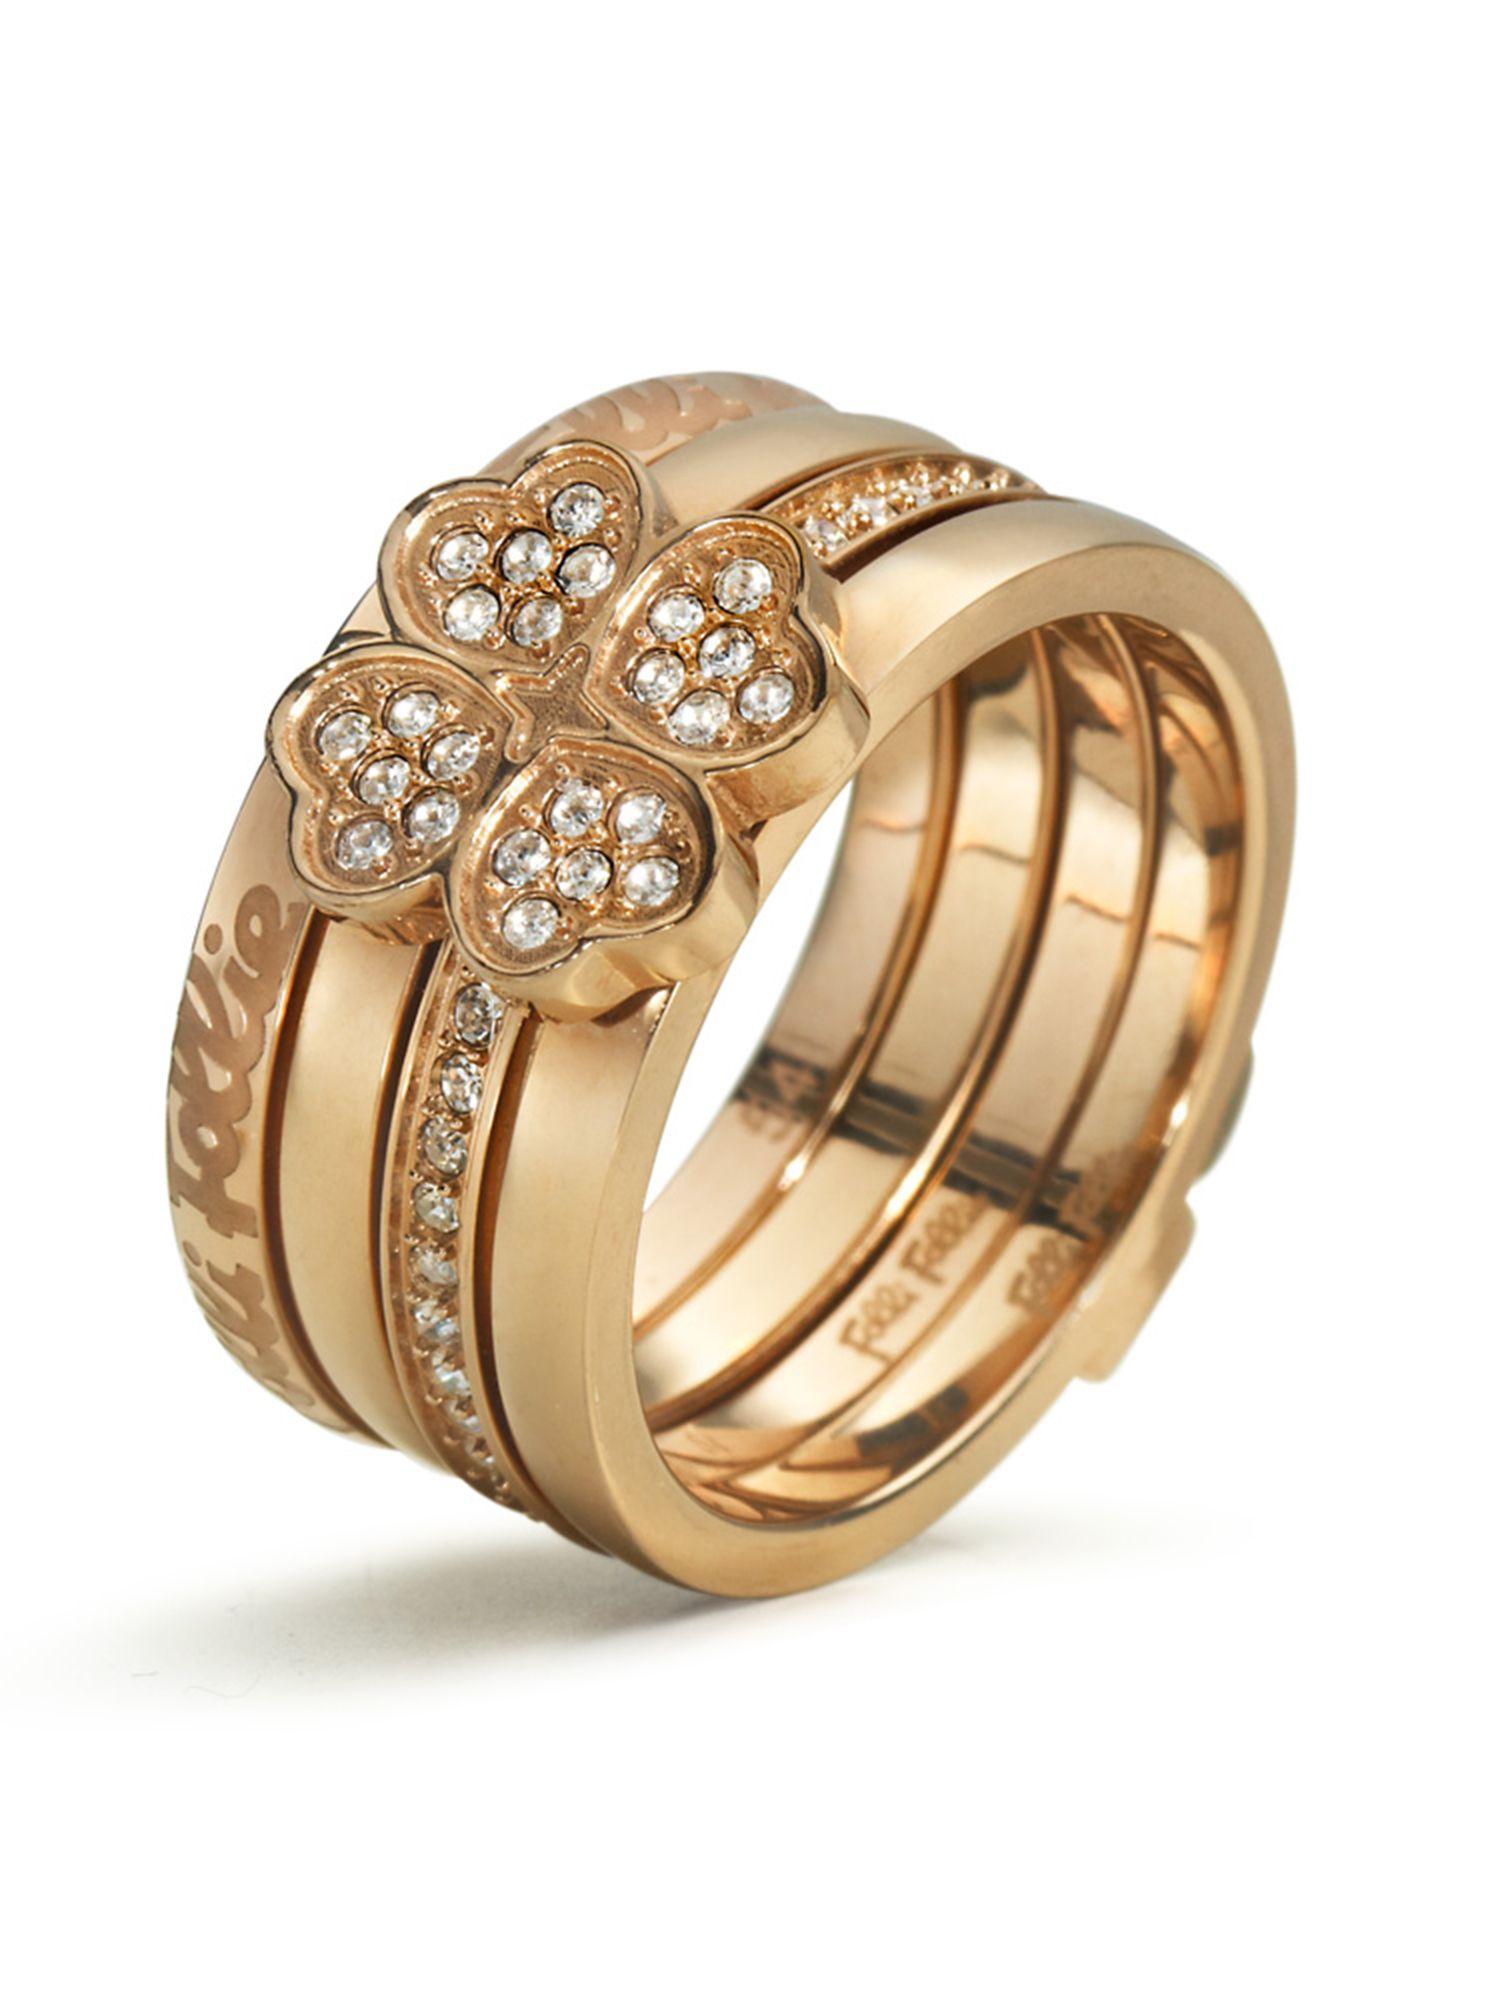 Folli follie Eternal Heart Ring in Pink (Rose Gold)